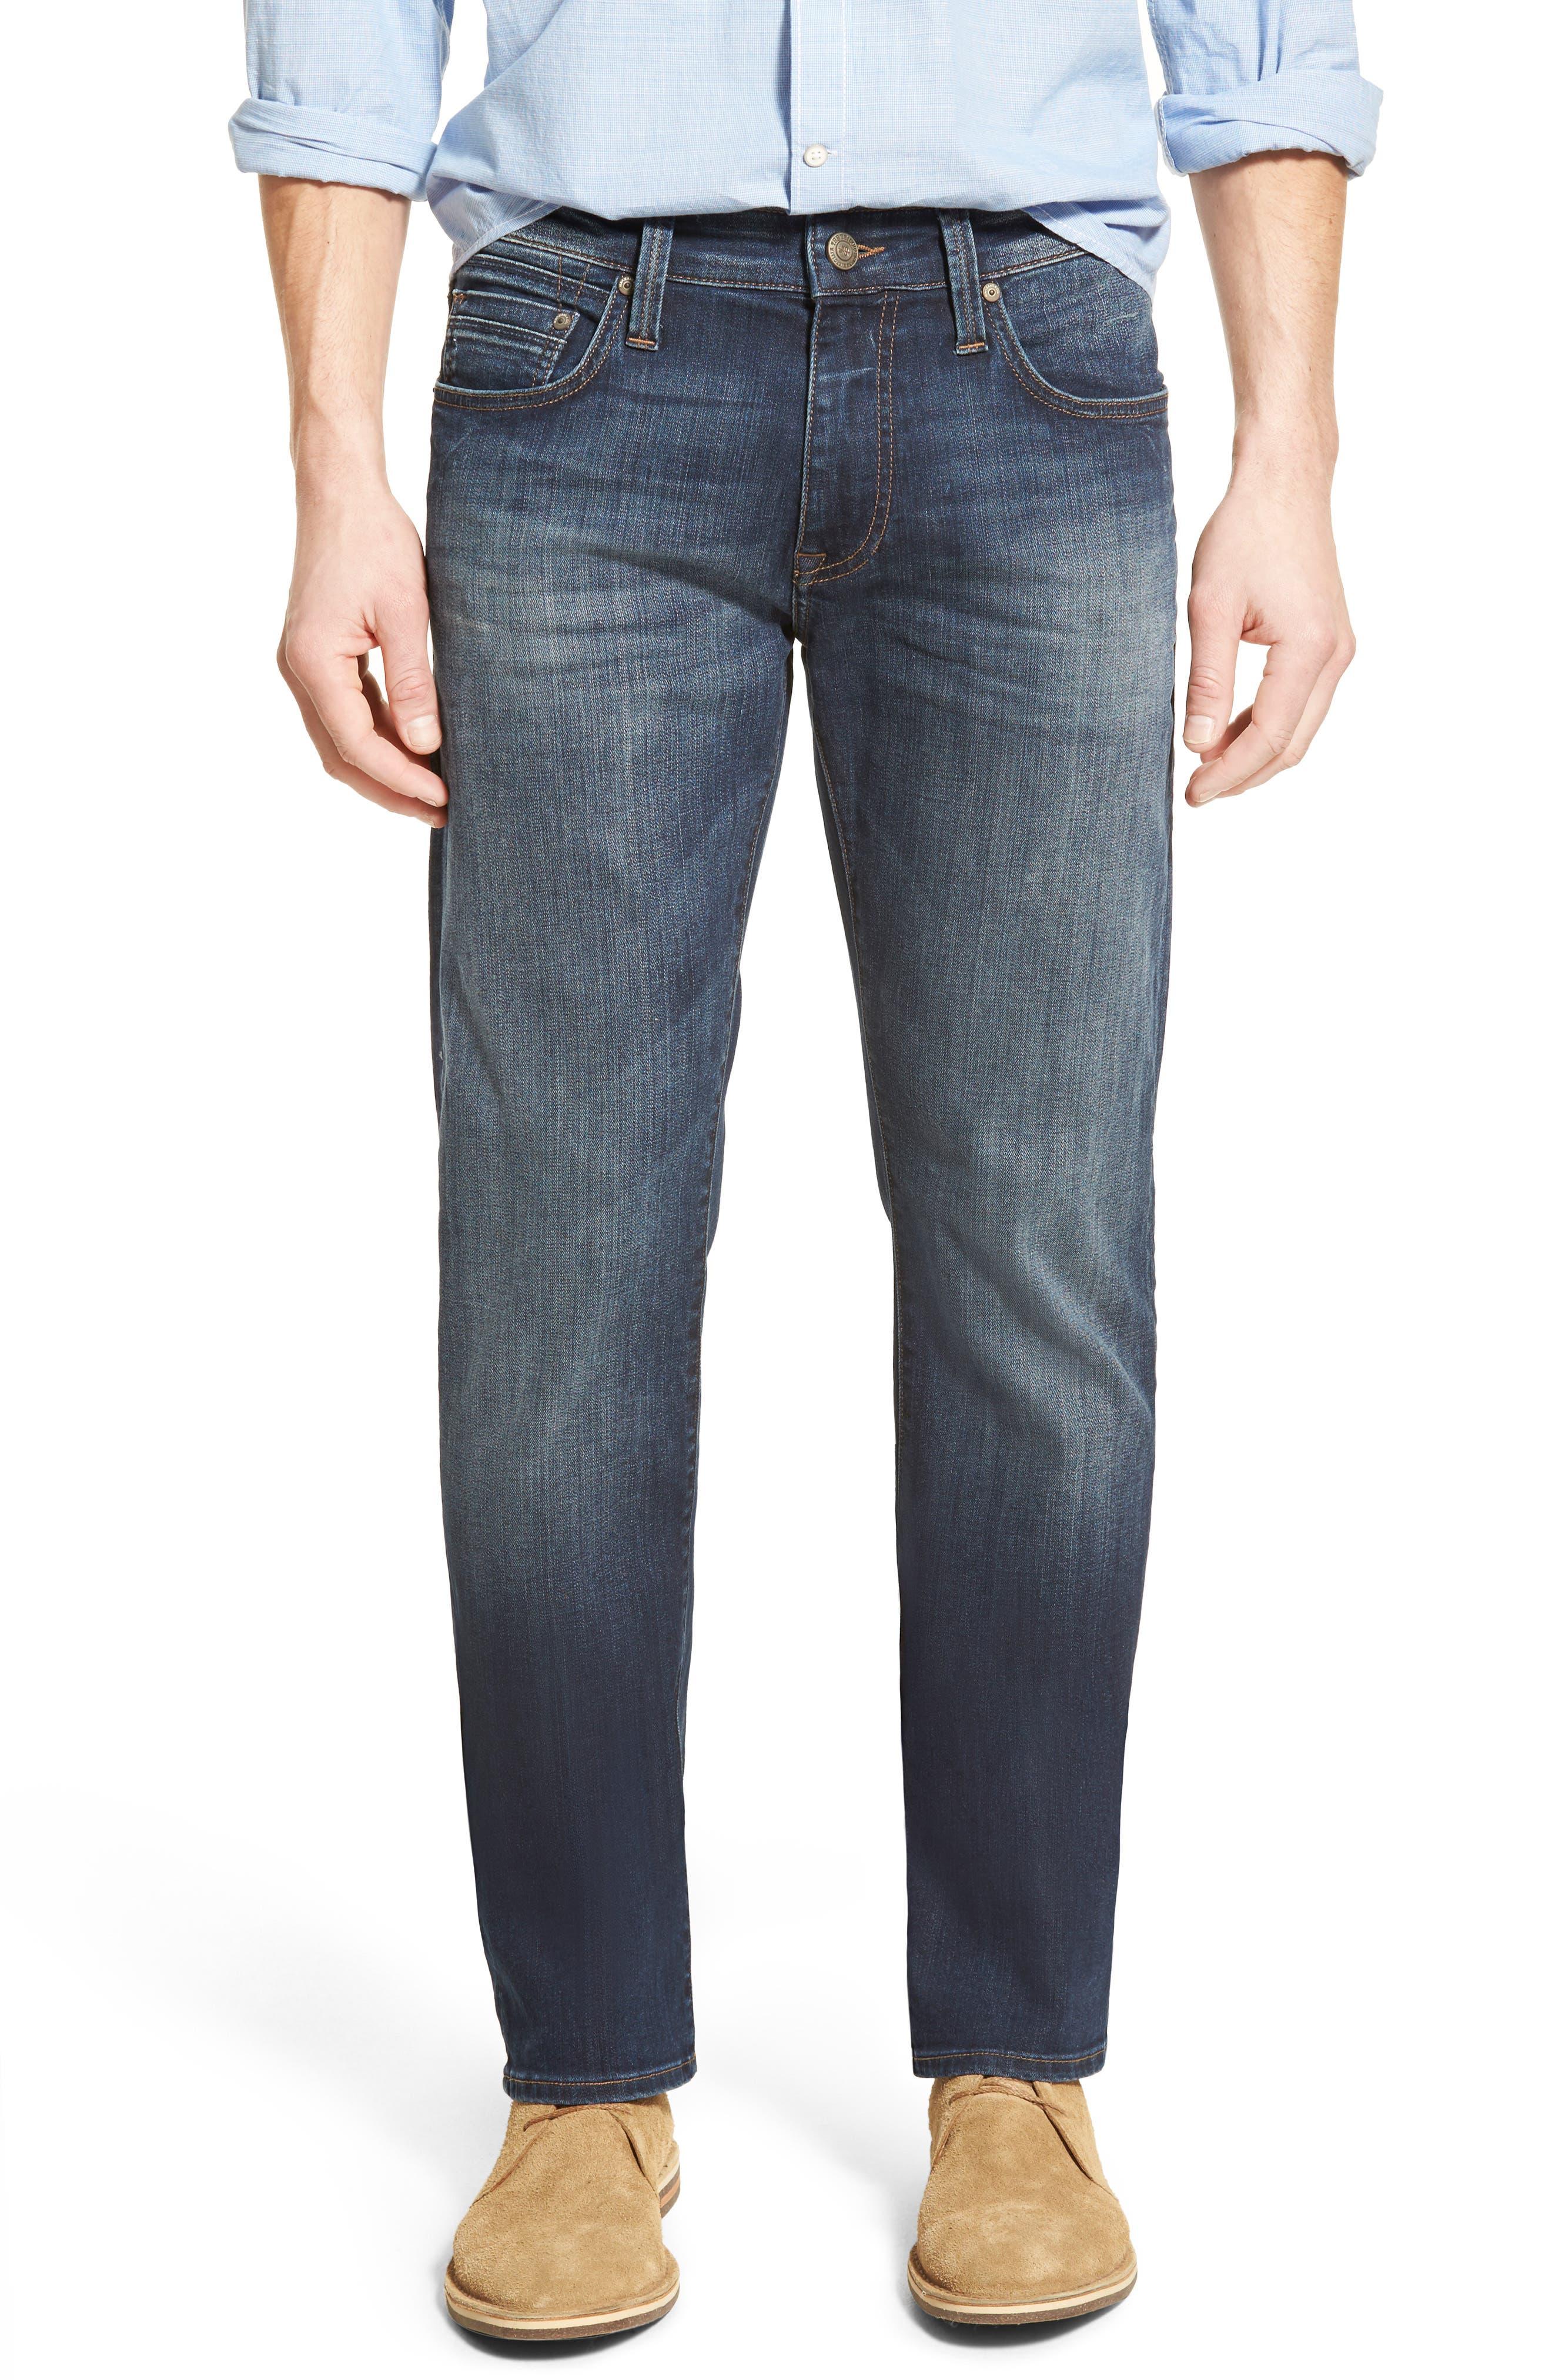 MAVI JEANS Zach Straight Leg Jeans, Main, color, DARK BRUSHED WILLIAMSBURG